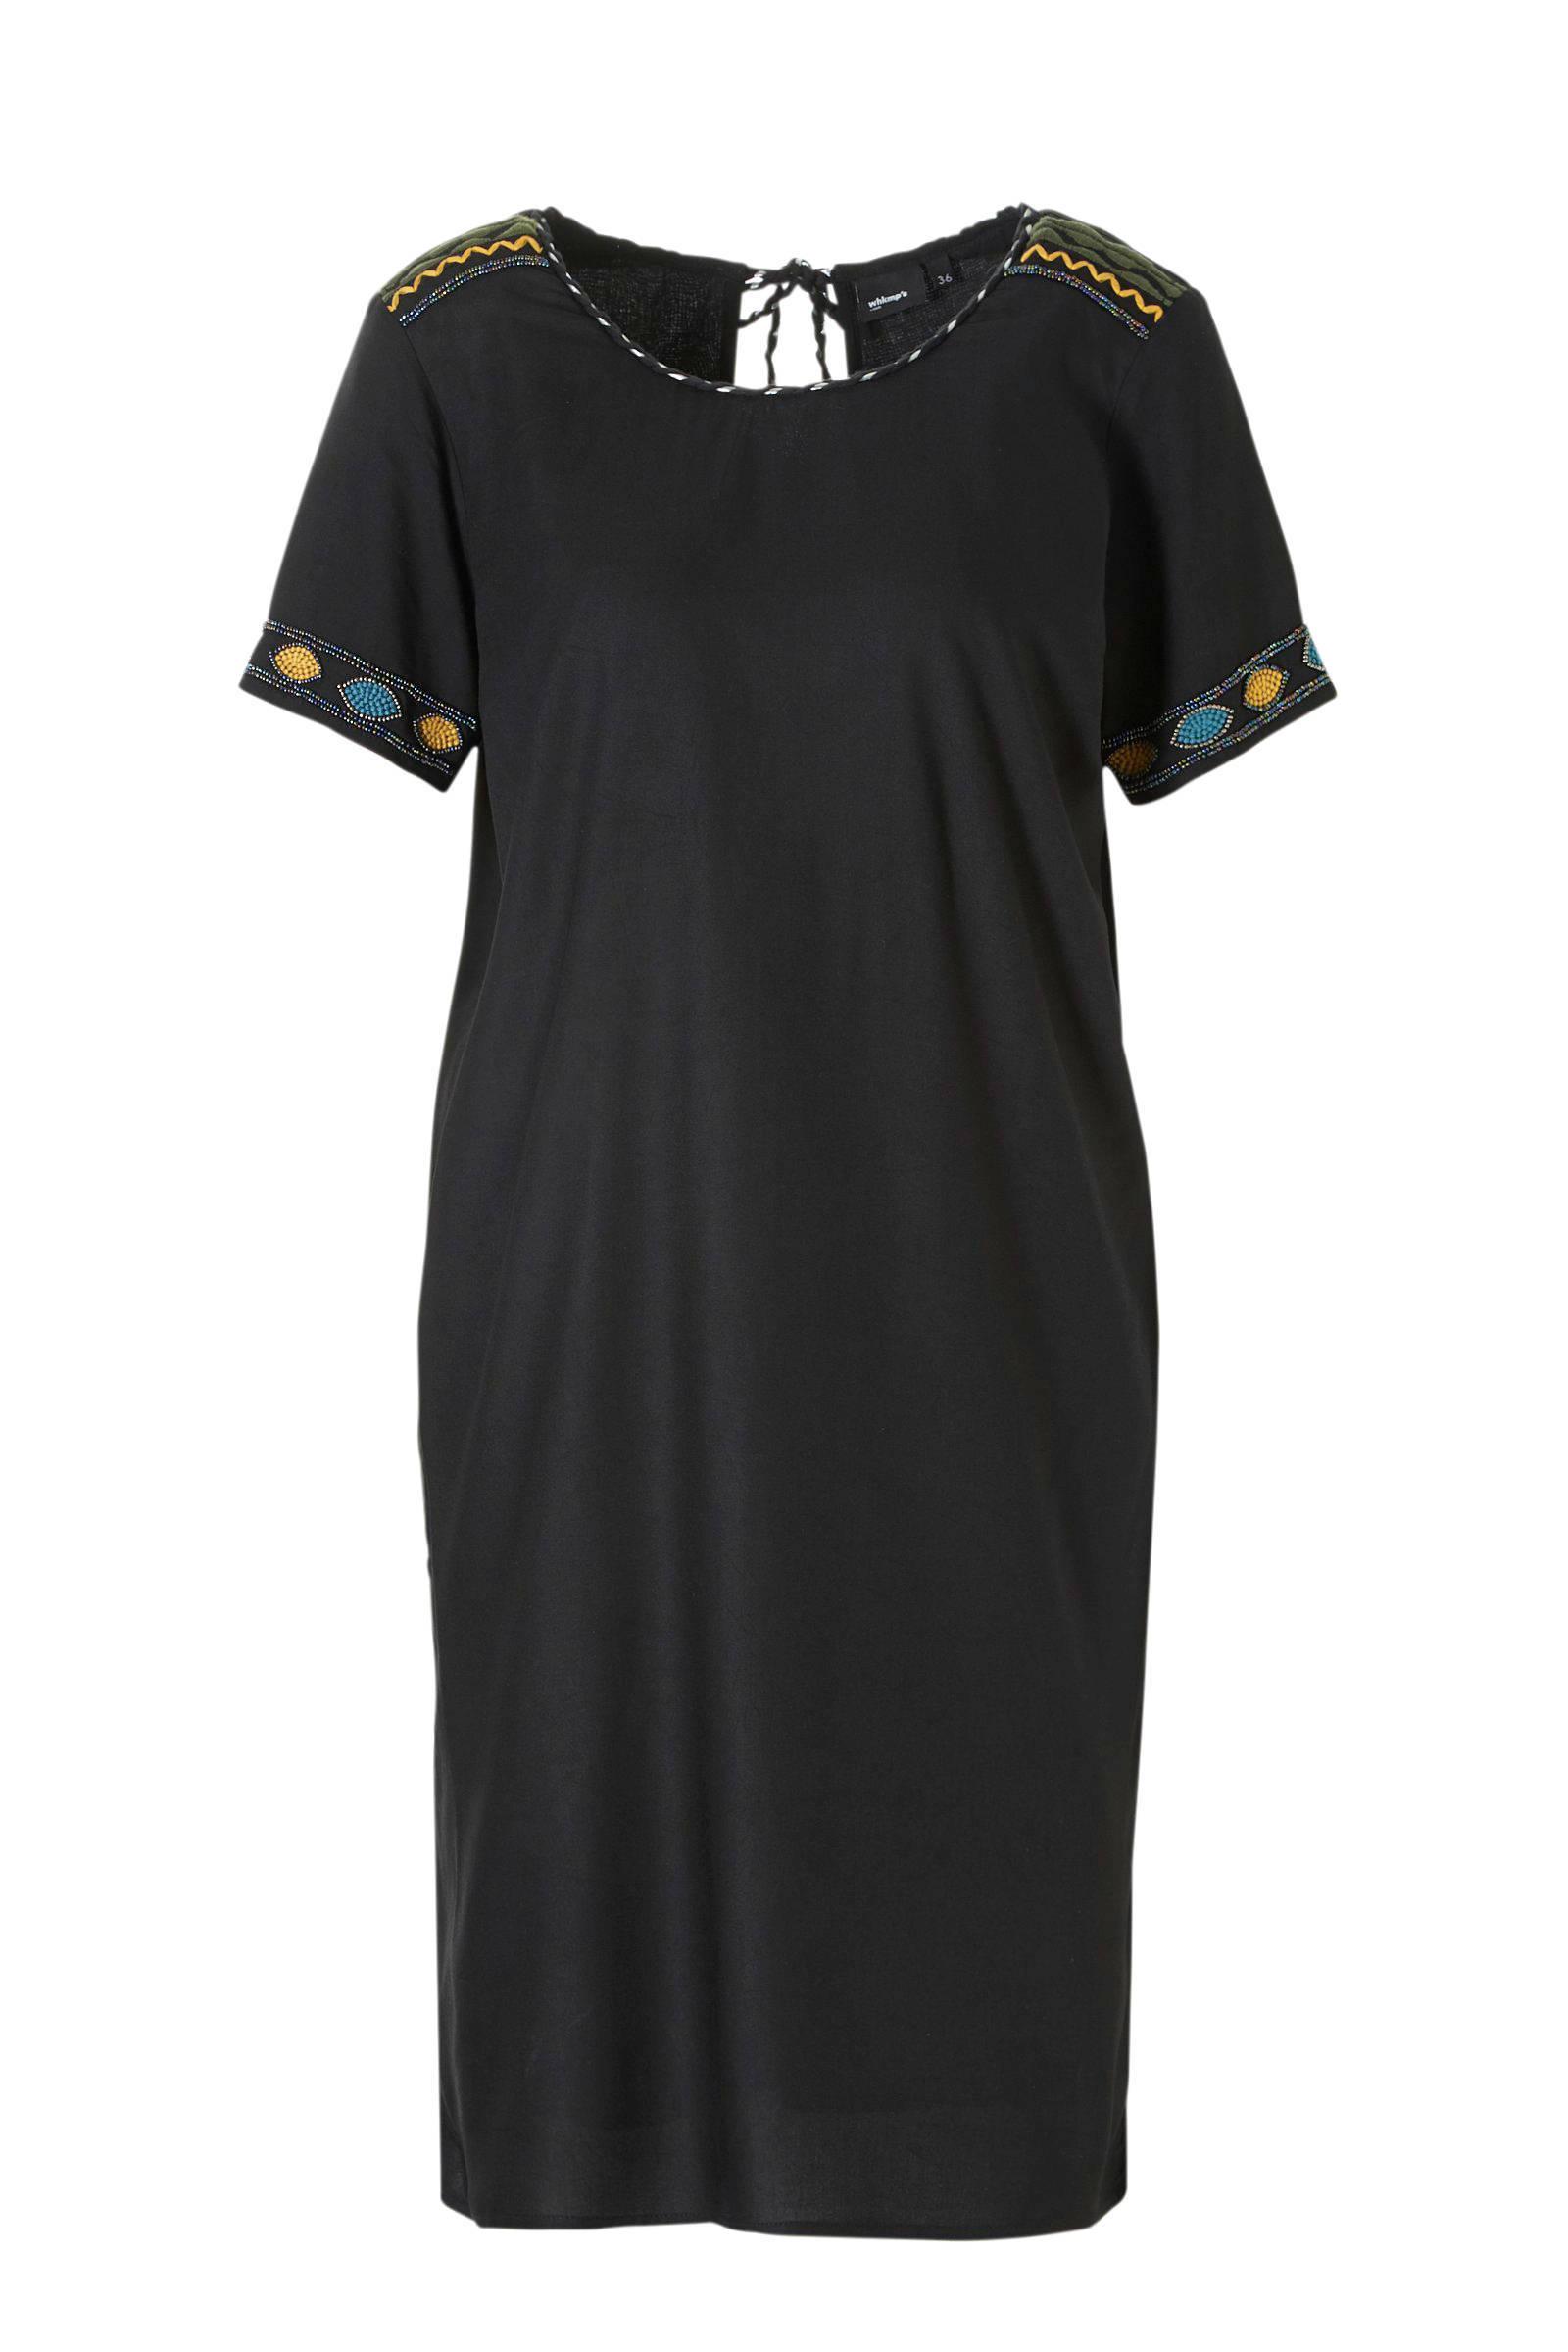 zwart jurkje zonder mouw